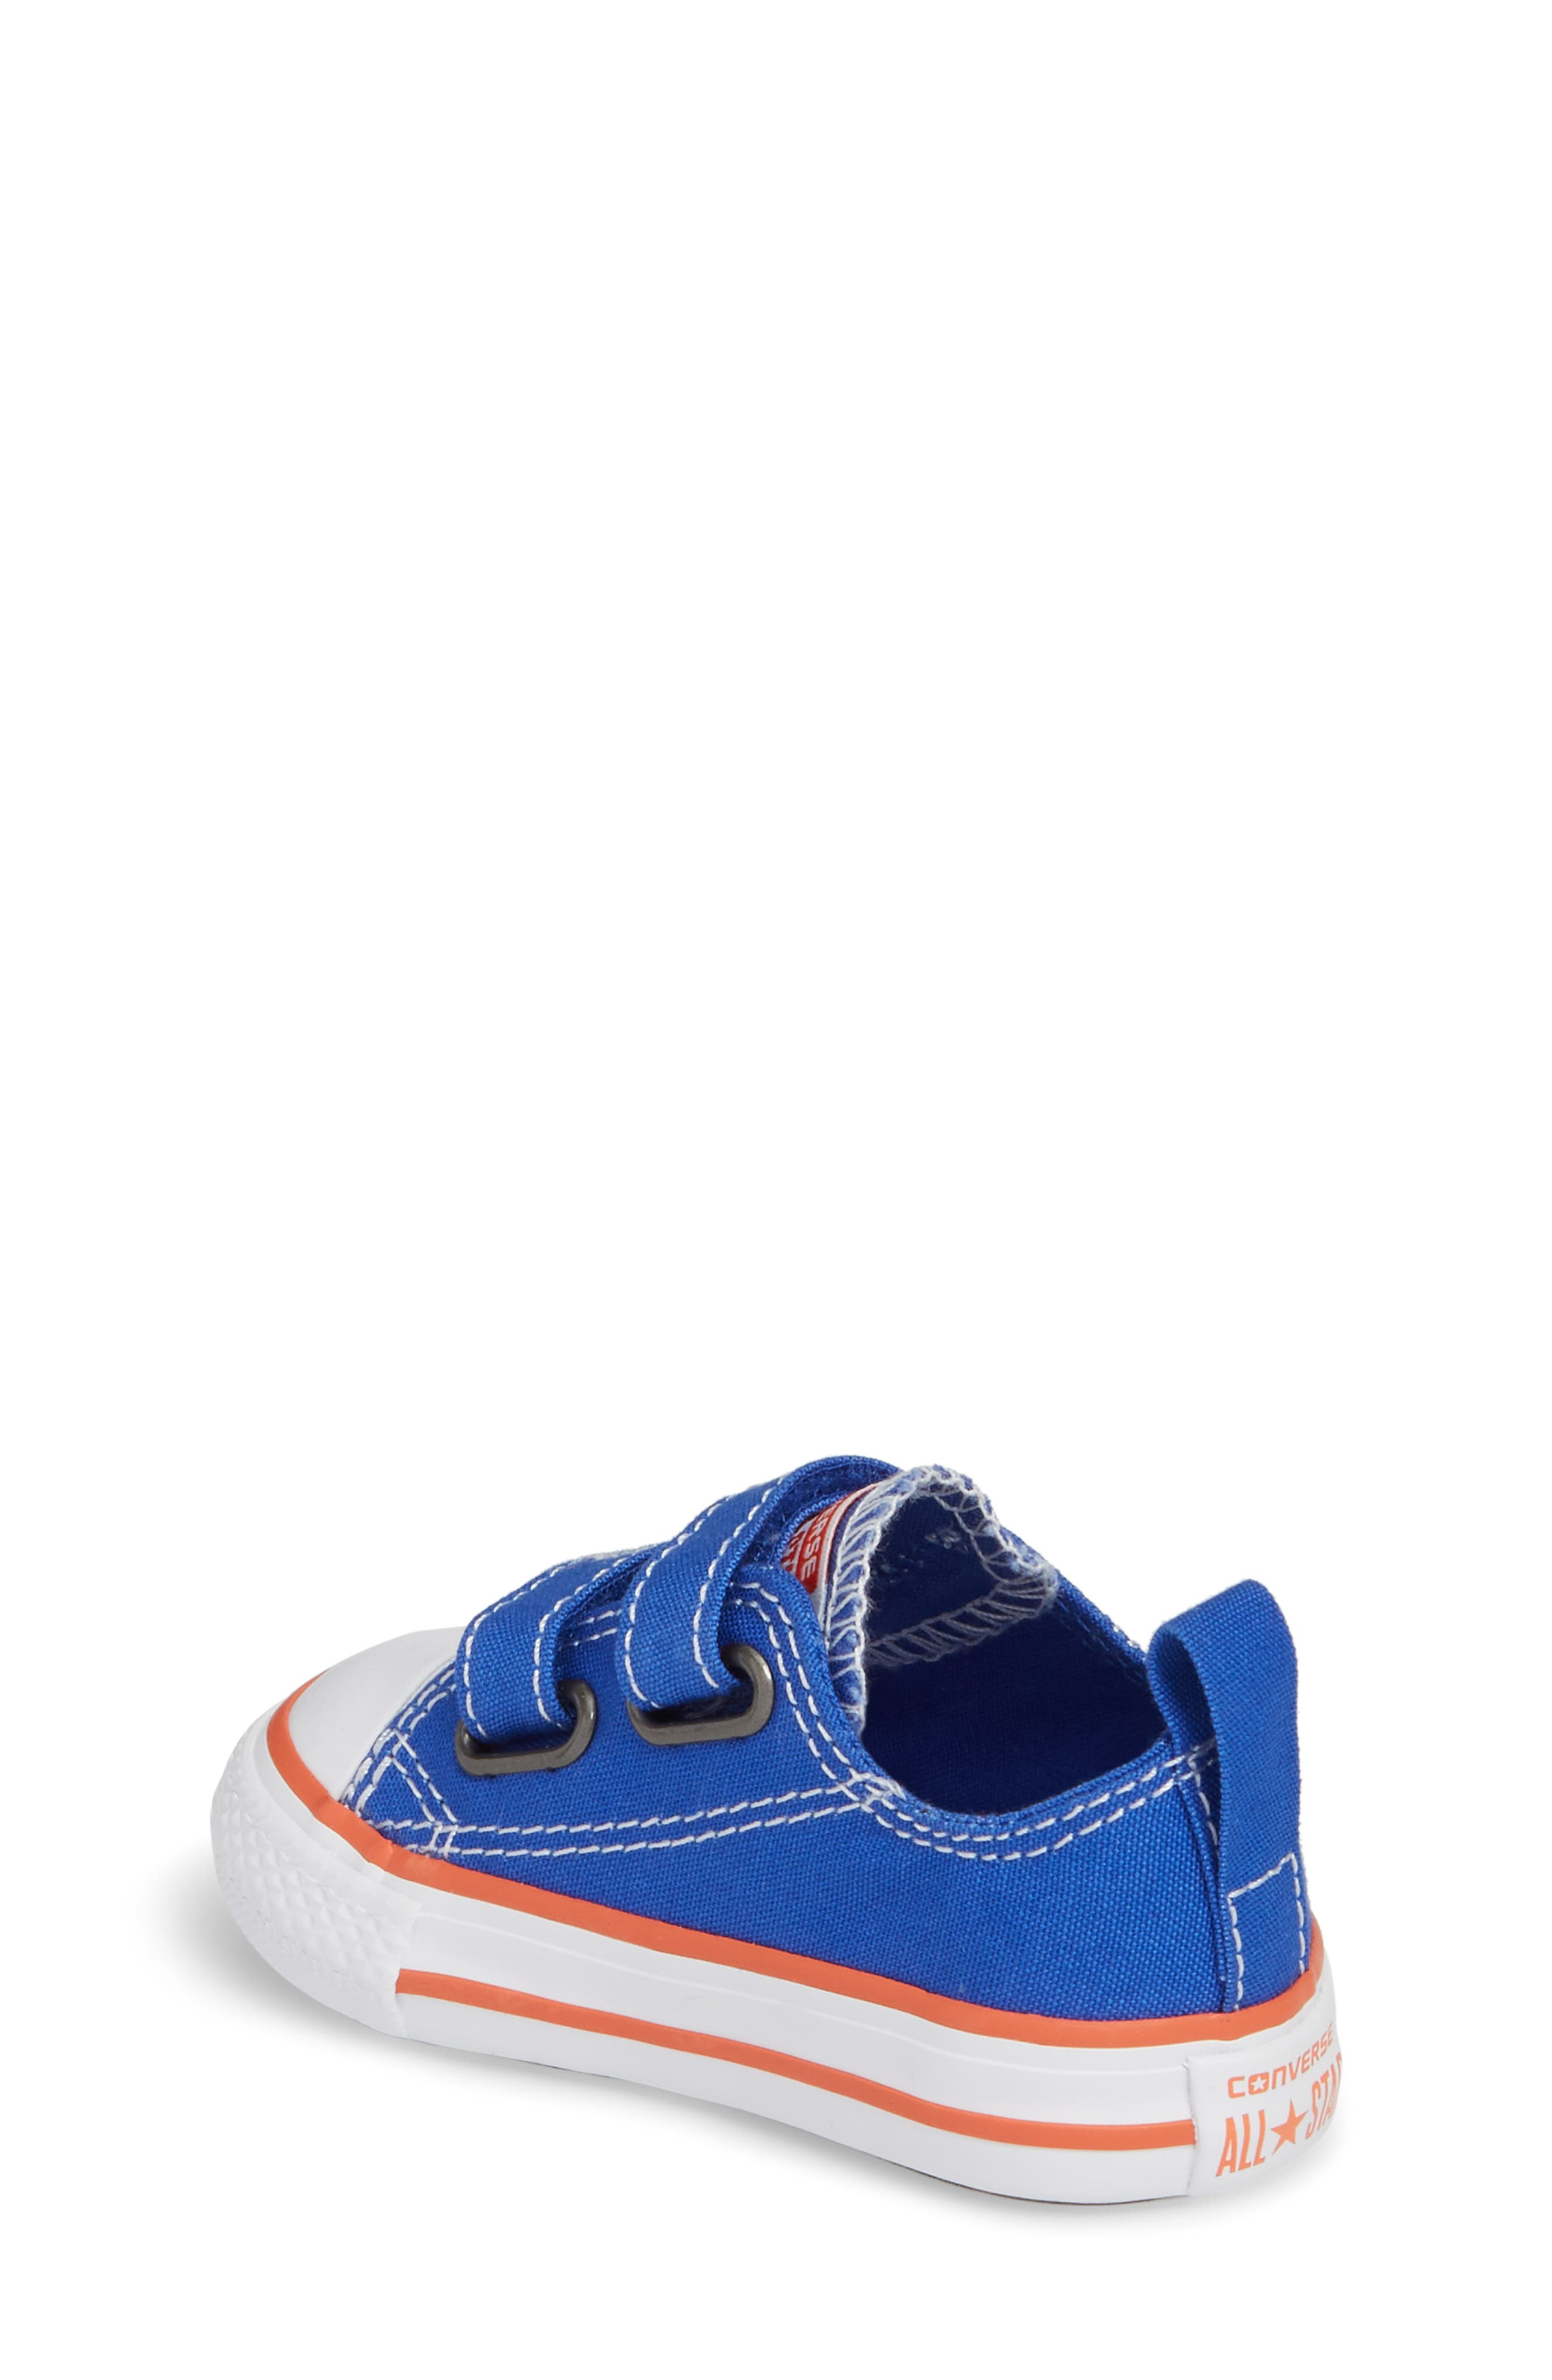 Chuck Taylor<sup>®</sup> All Star<sup>®</sup> Seasonal 2V Low Top Sneaker,                             Alternate thumbnail 2, color,                             483